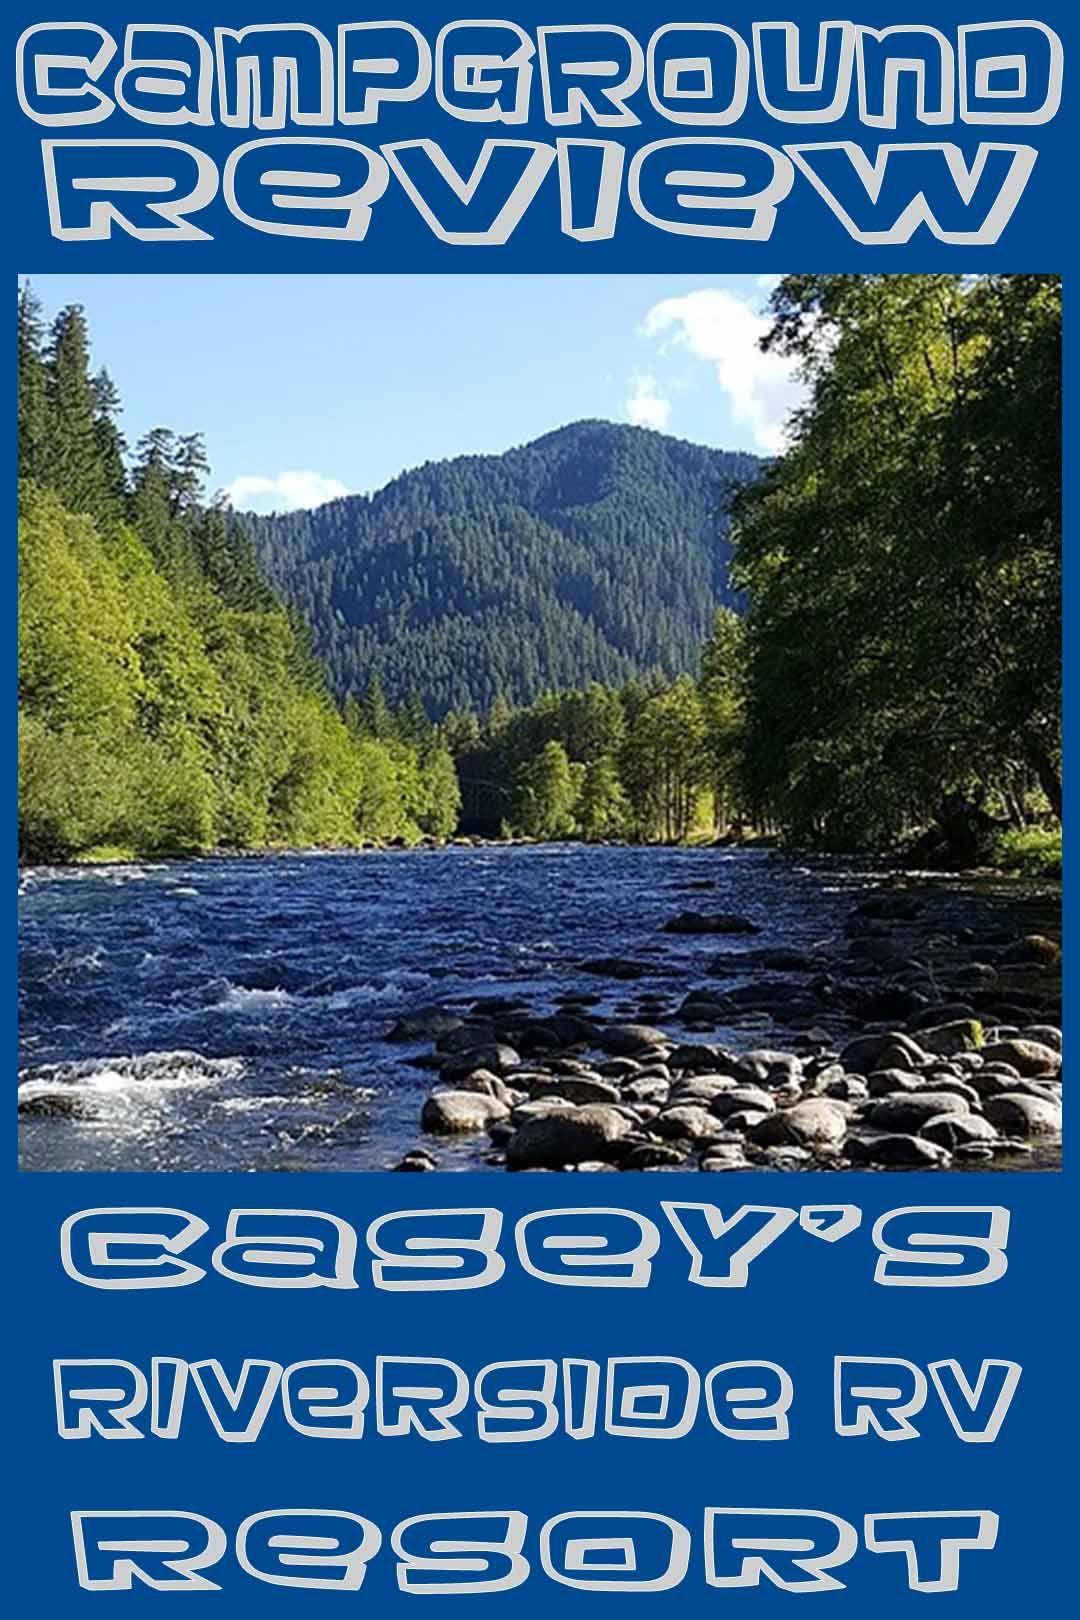 Campground Review Casey S Riverside Rv Resort Westfir Oregon Heartlandrvs Campground Oregon Rv Rving Rvlife Rv Parks Campground Reviews Oregon Travel